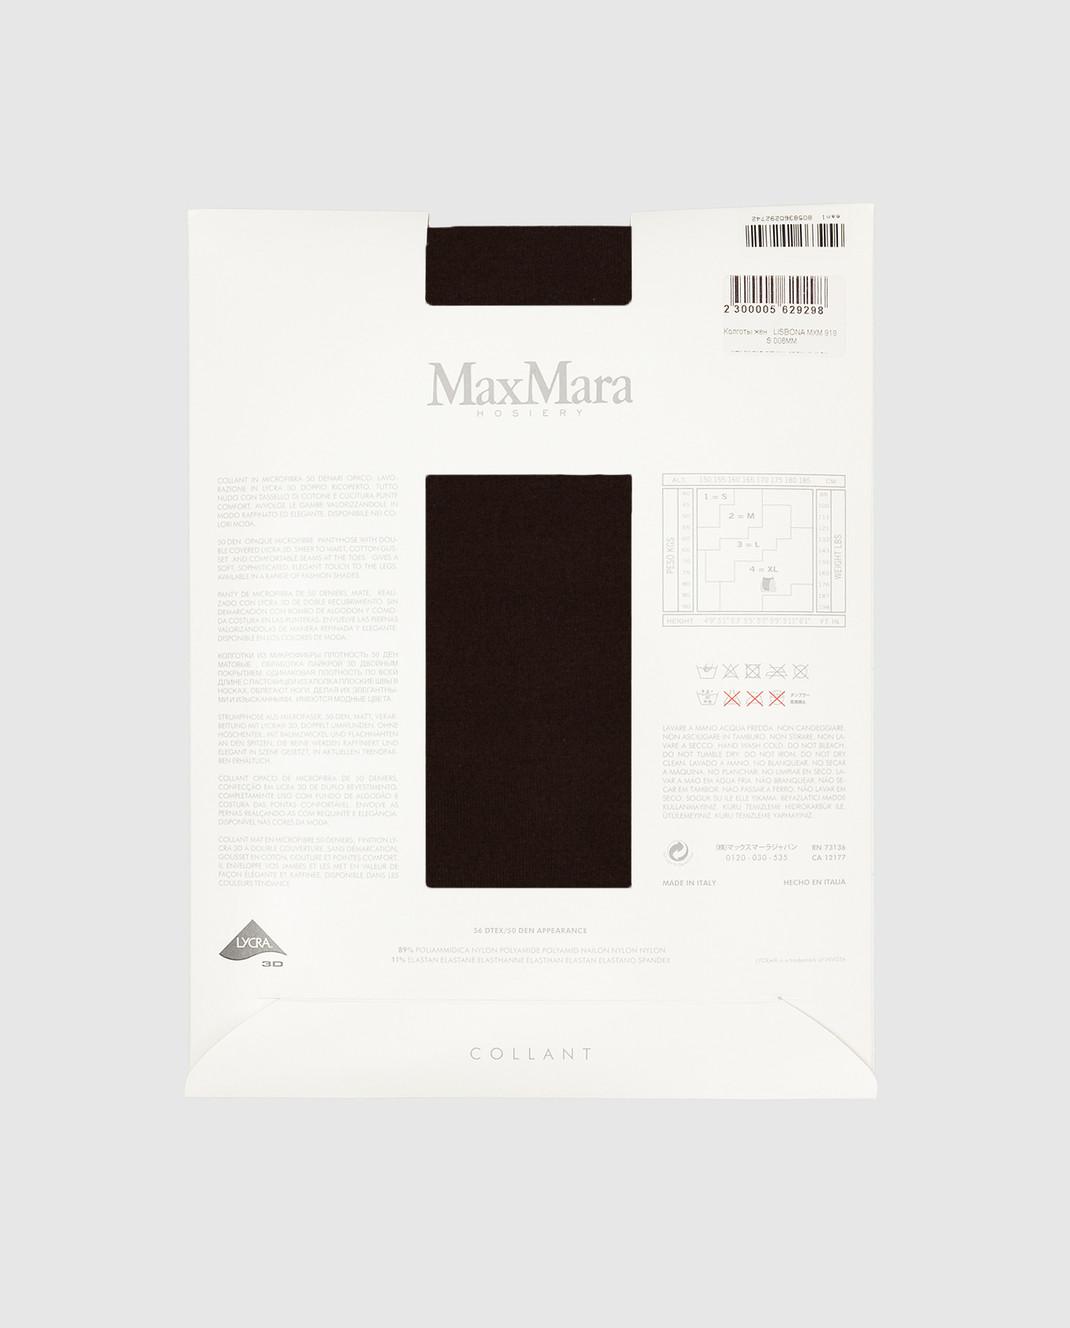 Max Mara Темно-коричневые колготы 50 ден изображение 4